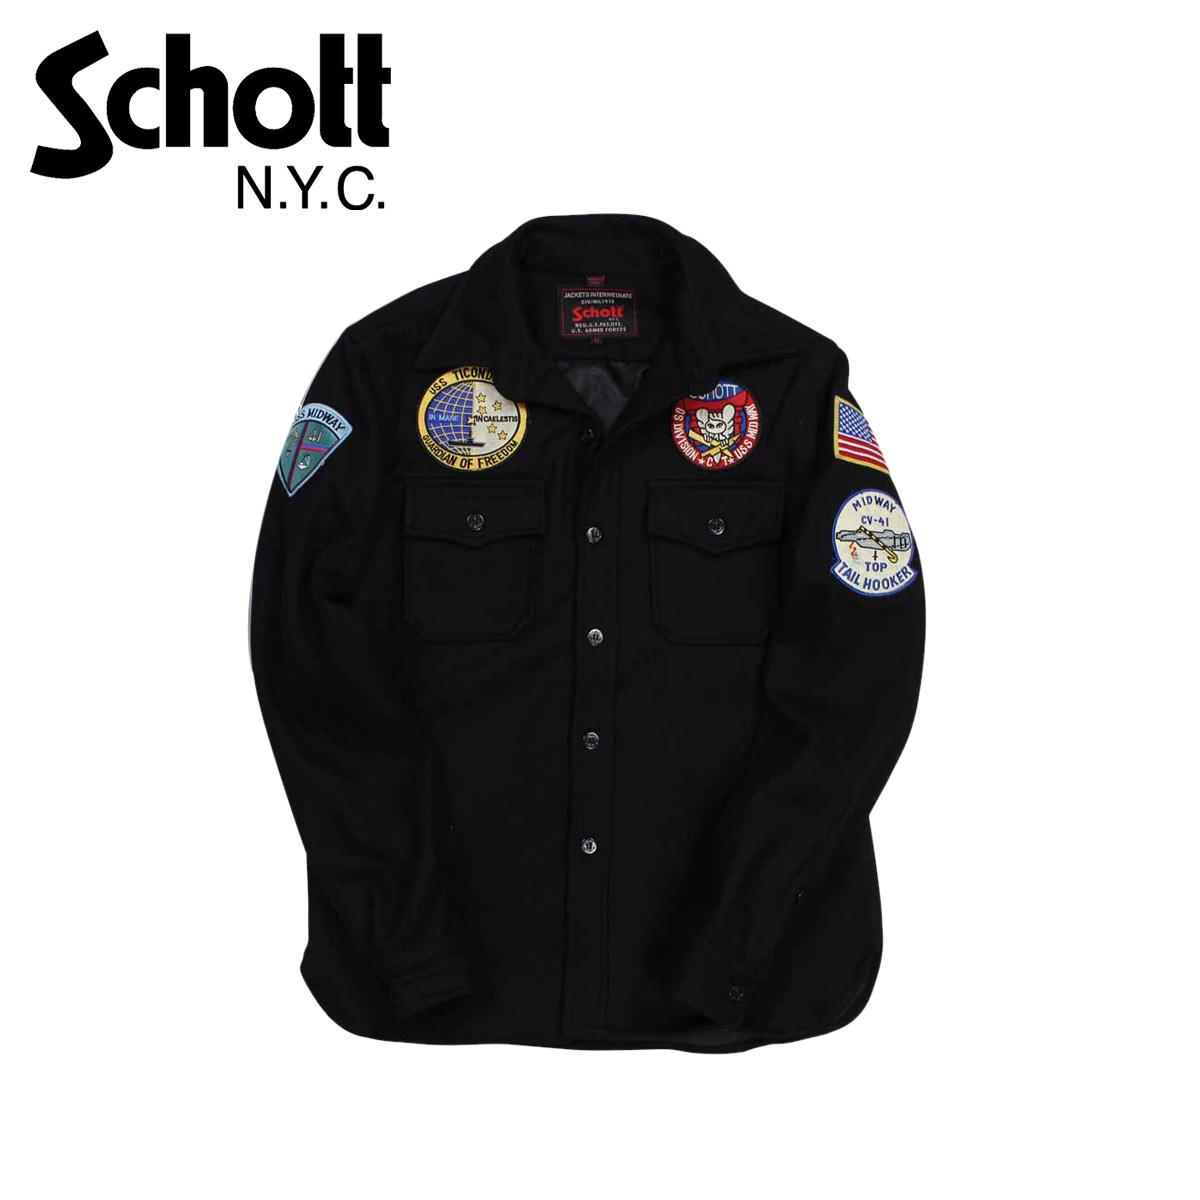 Schott EMBELLISHED CPO WOOL SHIRT ショット ジャケット シャツジャケット メンズ ブラック 7710